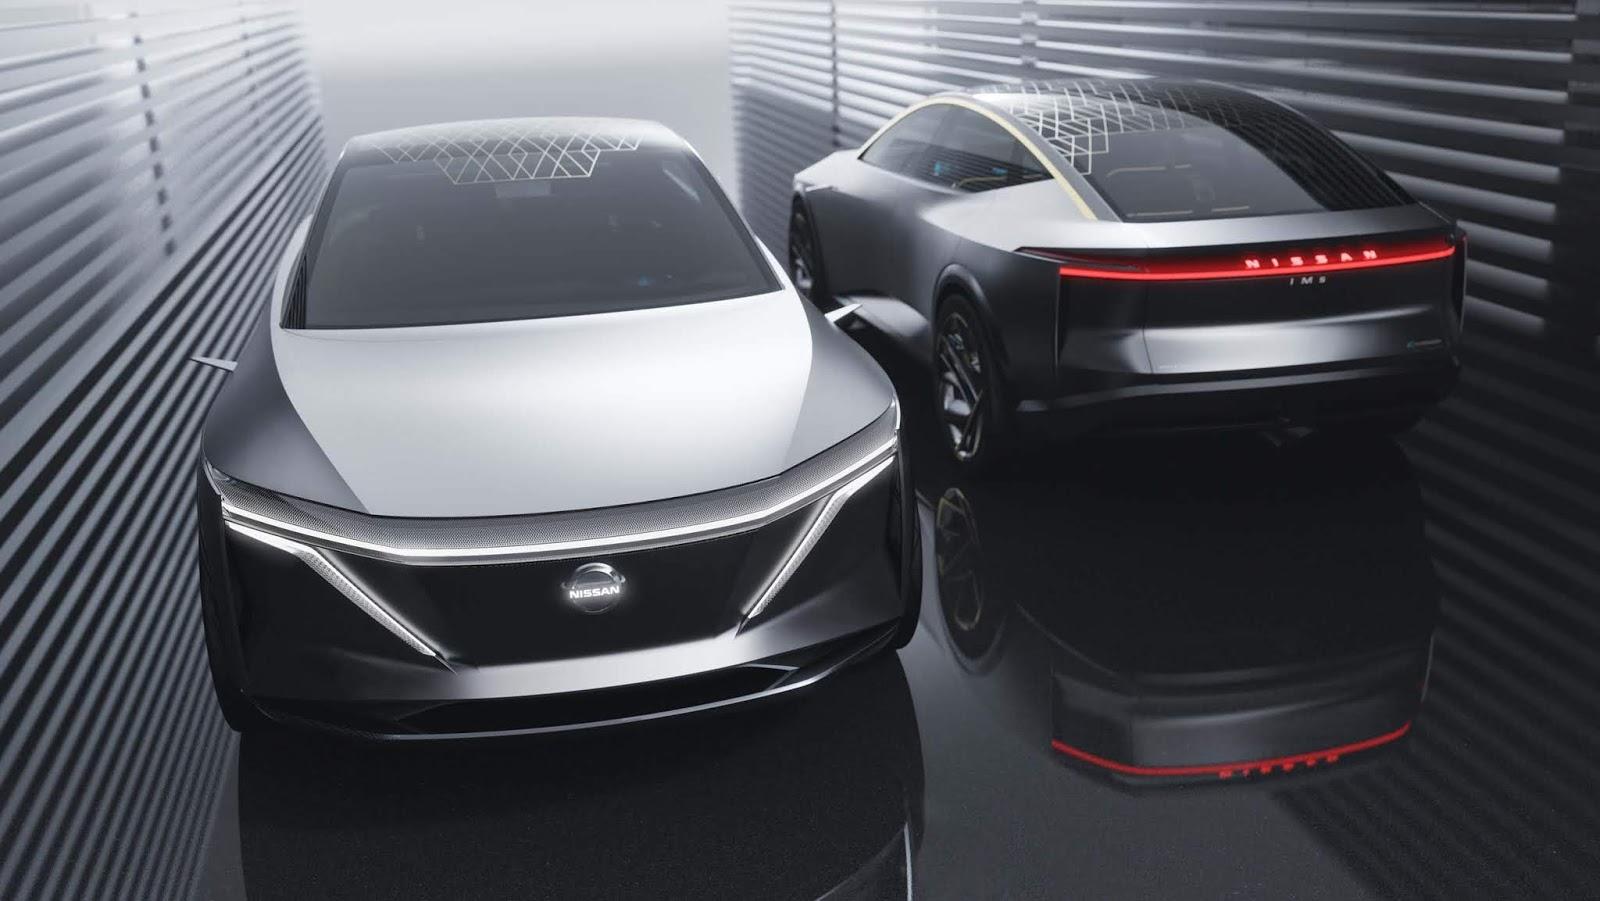 Nissan2BIMs2B2528112529 1 Σου αρέσει το τετρακίνητο σπορ σεντάν της Nissan; Electric cars, Nissan, video, videos, zblog, αυτόνομα, Αυτόνομη οδήγηση, βίντεο, τετρακίνητα, τετρακίνητο